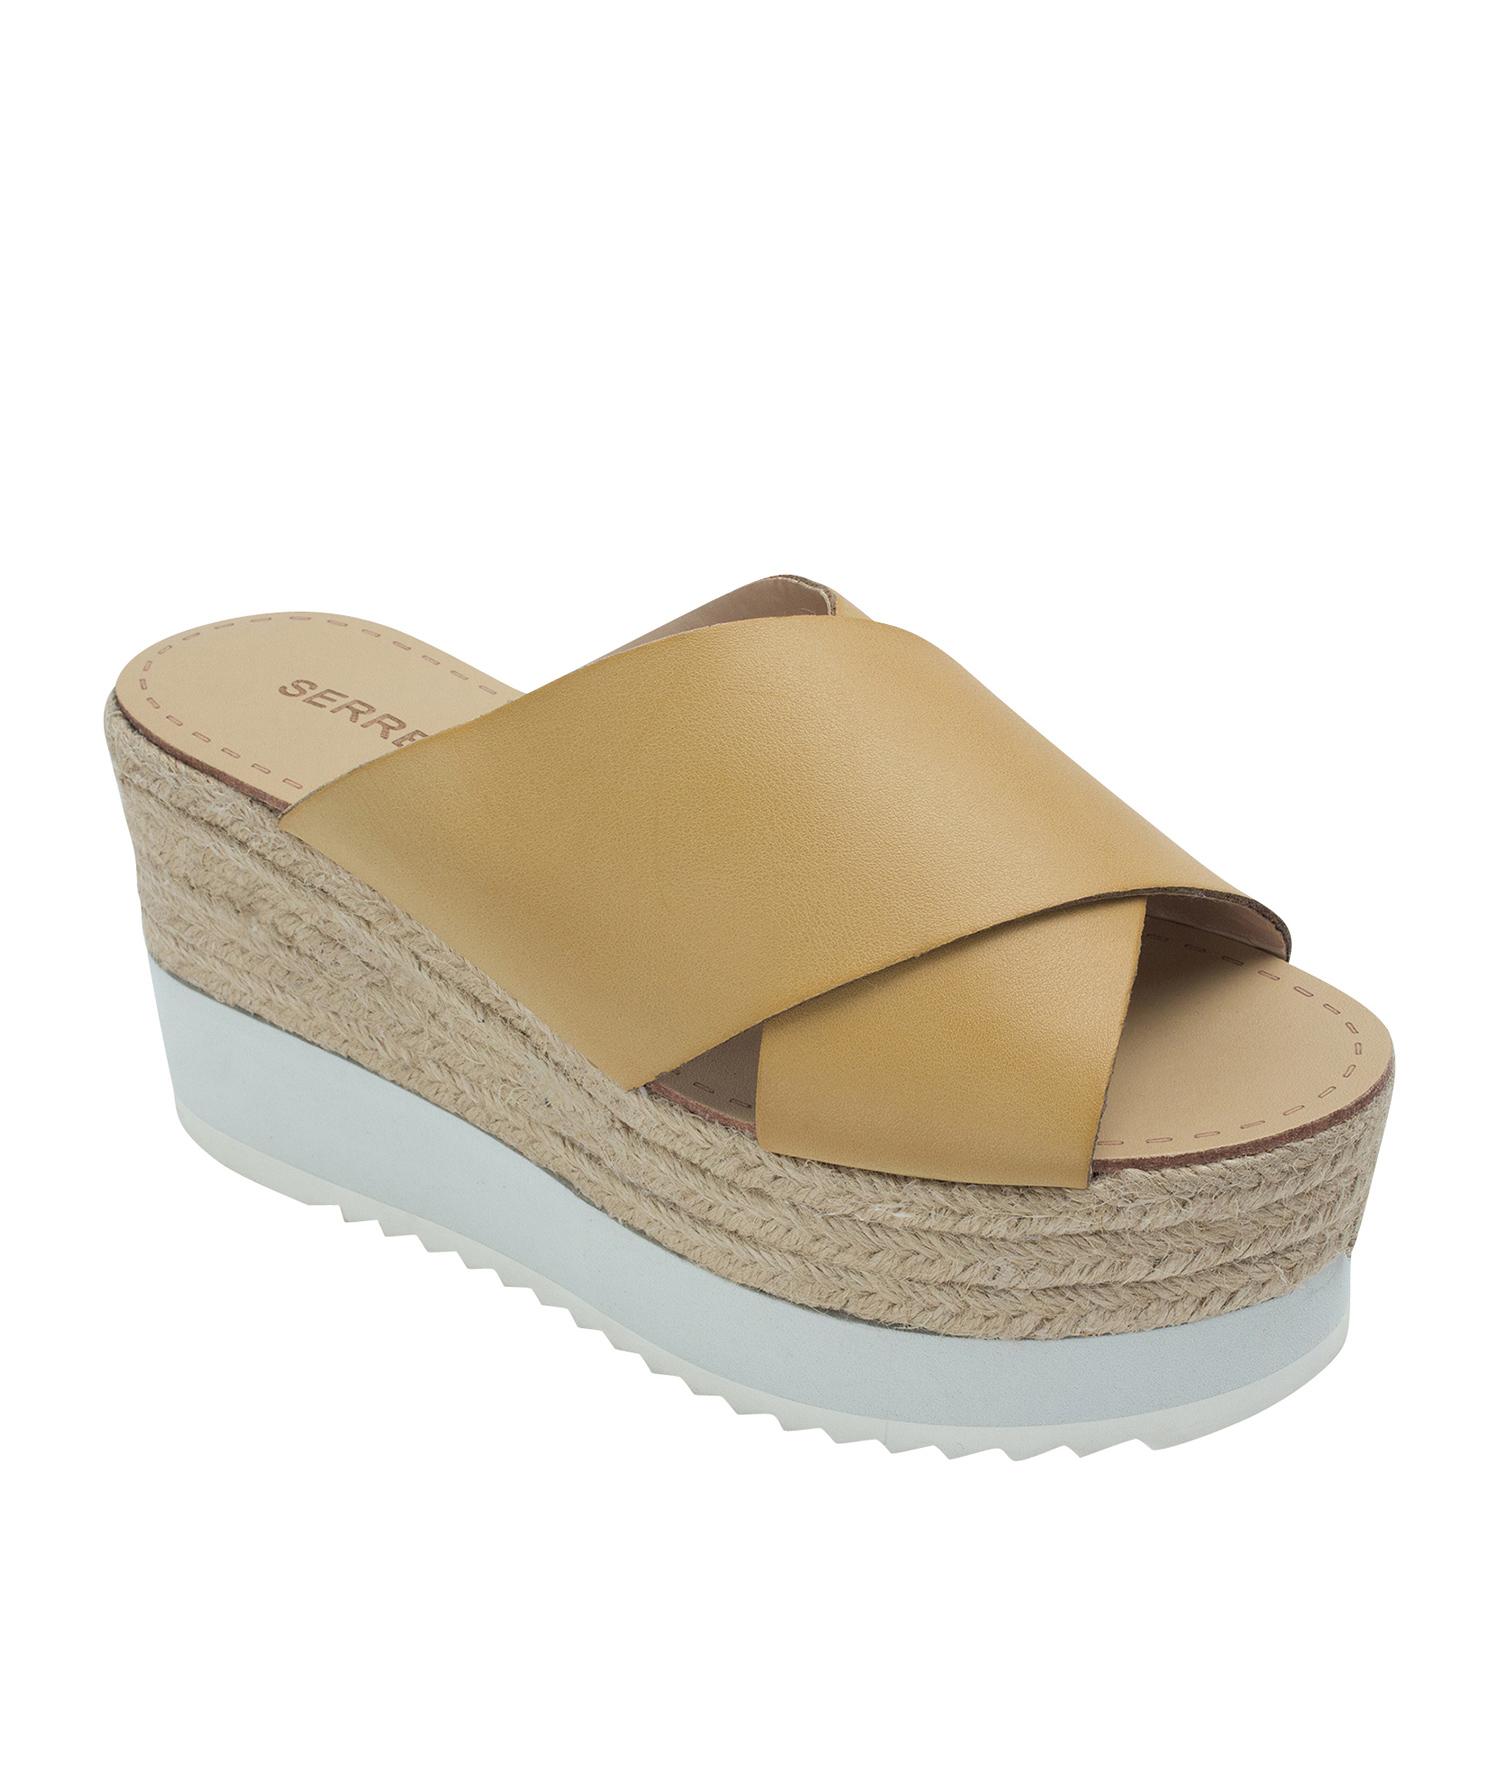 Women Espadrilles High Heel Ladies Leather Shoes Platform Sandals